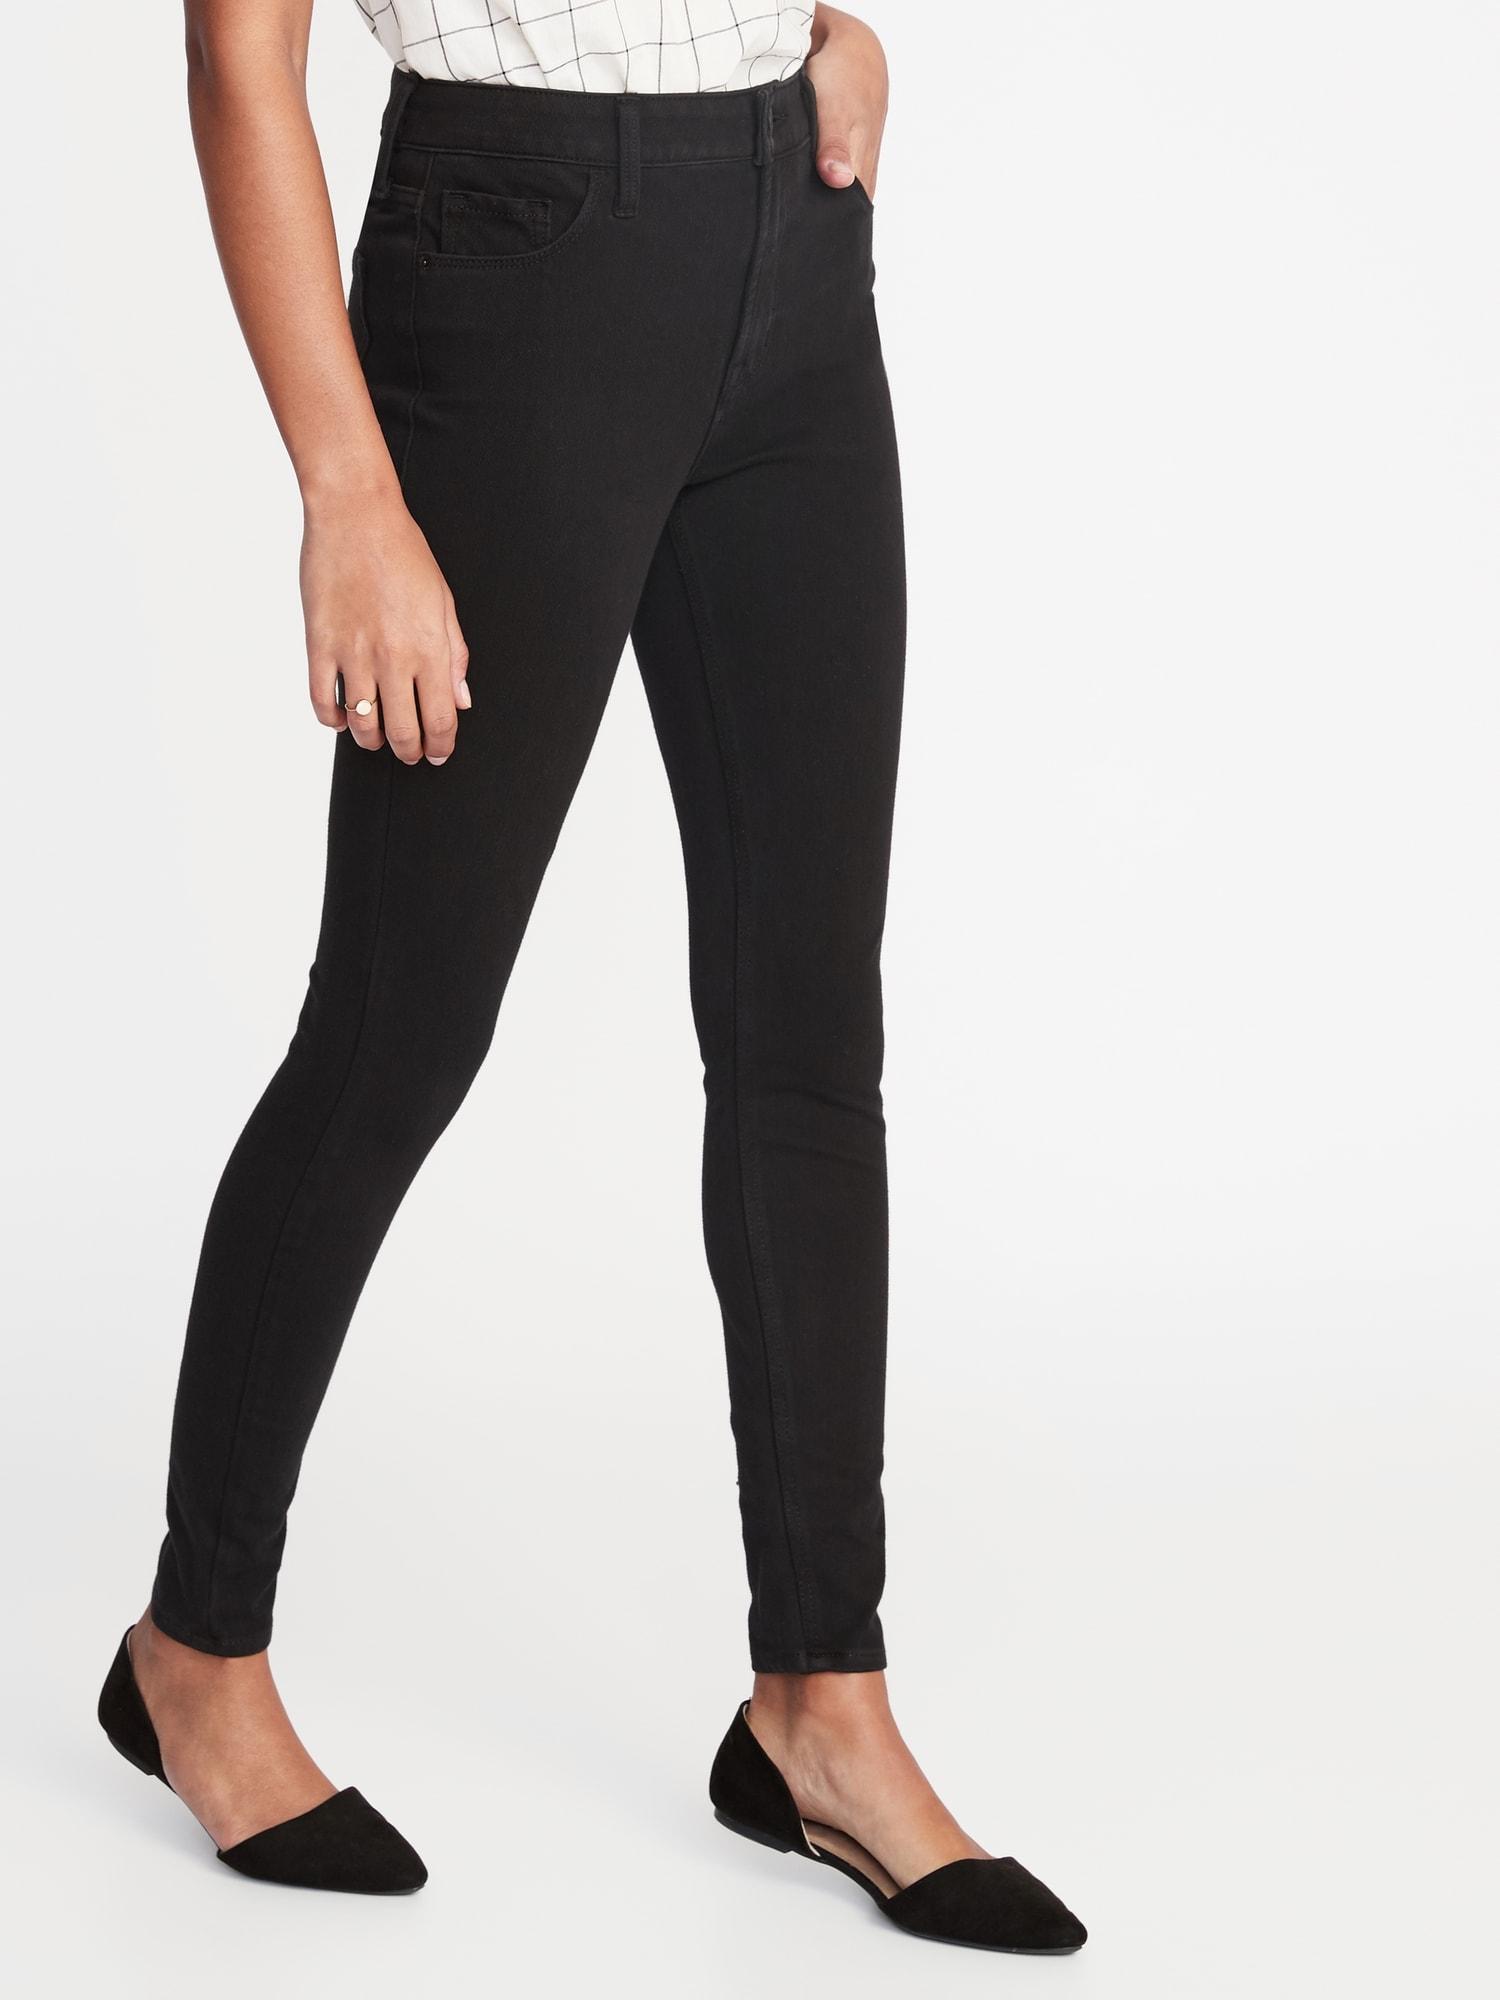 a418b745df616 High-Rise Rockstar 24/7 Sculpt Super Skinny Black Jeans for Women ...